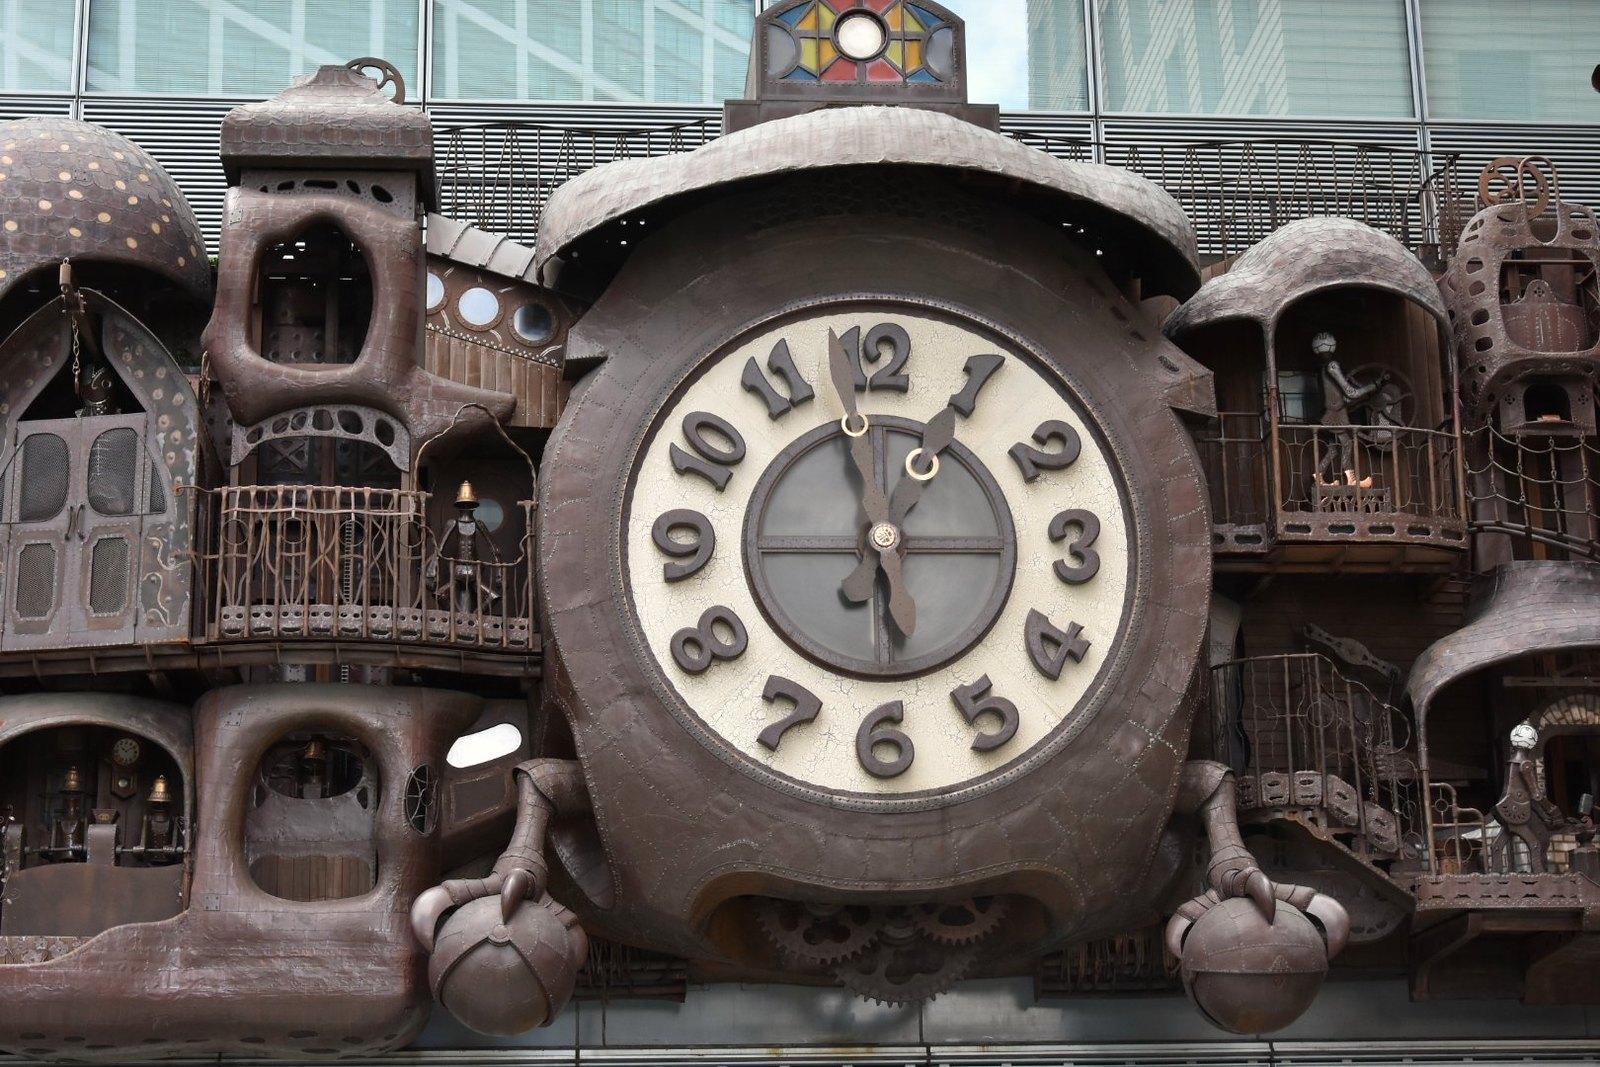 Shiodome - Horloge Ghibli